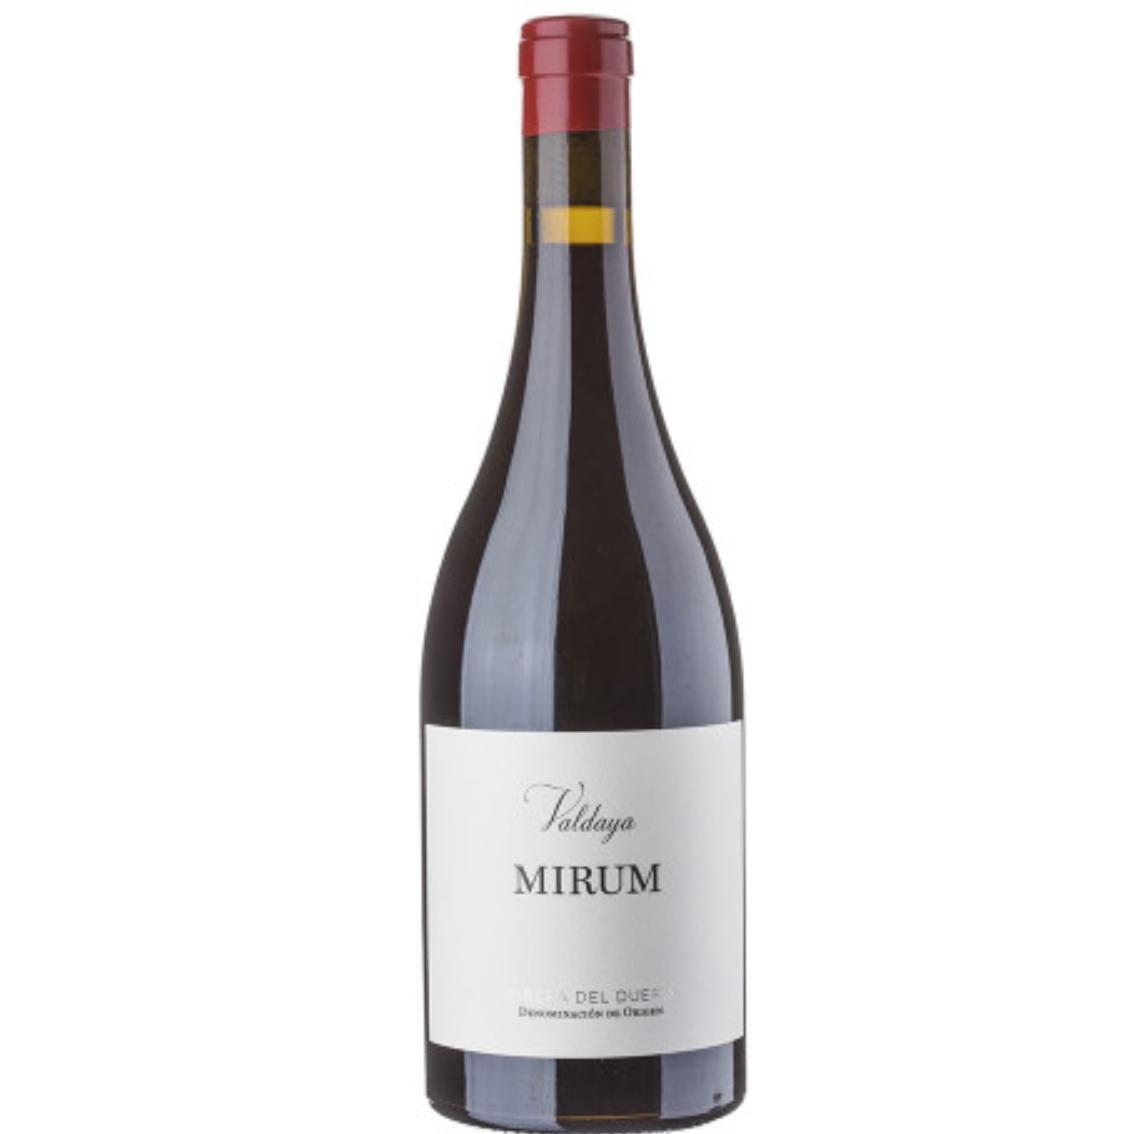 "2016 Bodegas Valdaya ""MIRUM"" - Ribera del Duero"